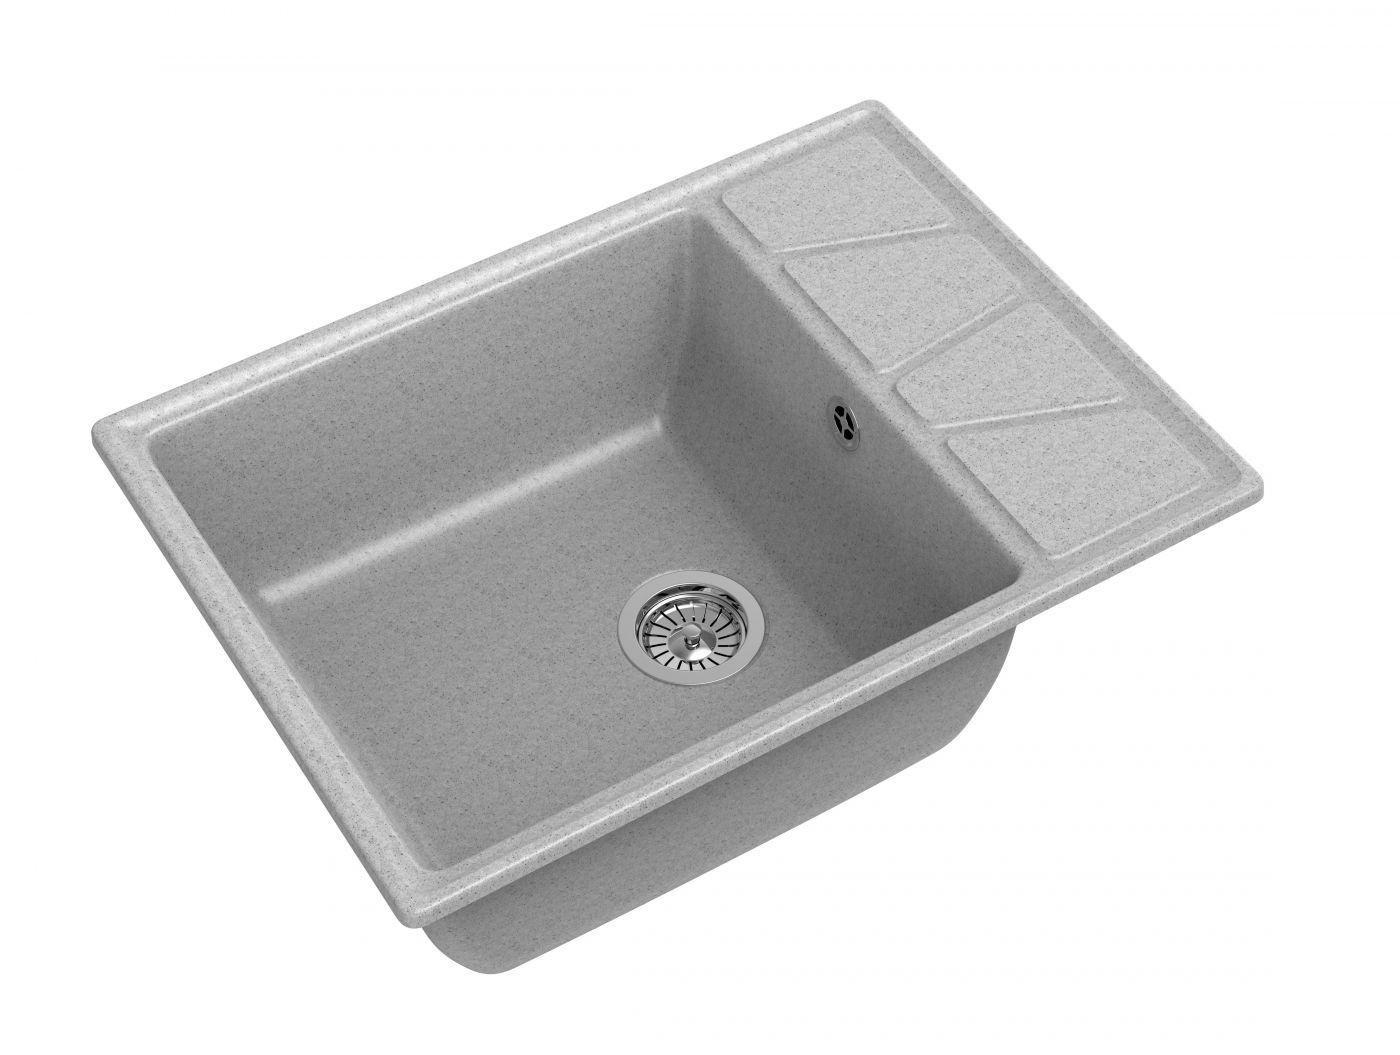 Мраморная мойка для кухни GranFest Vertex GF-V680L Серый